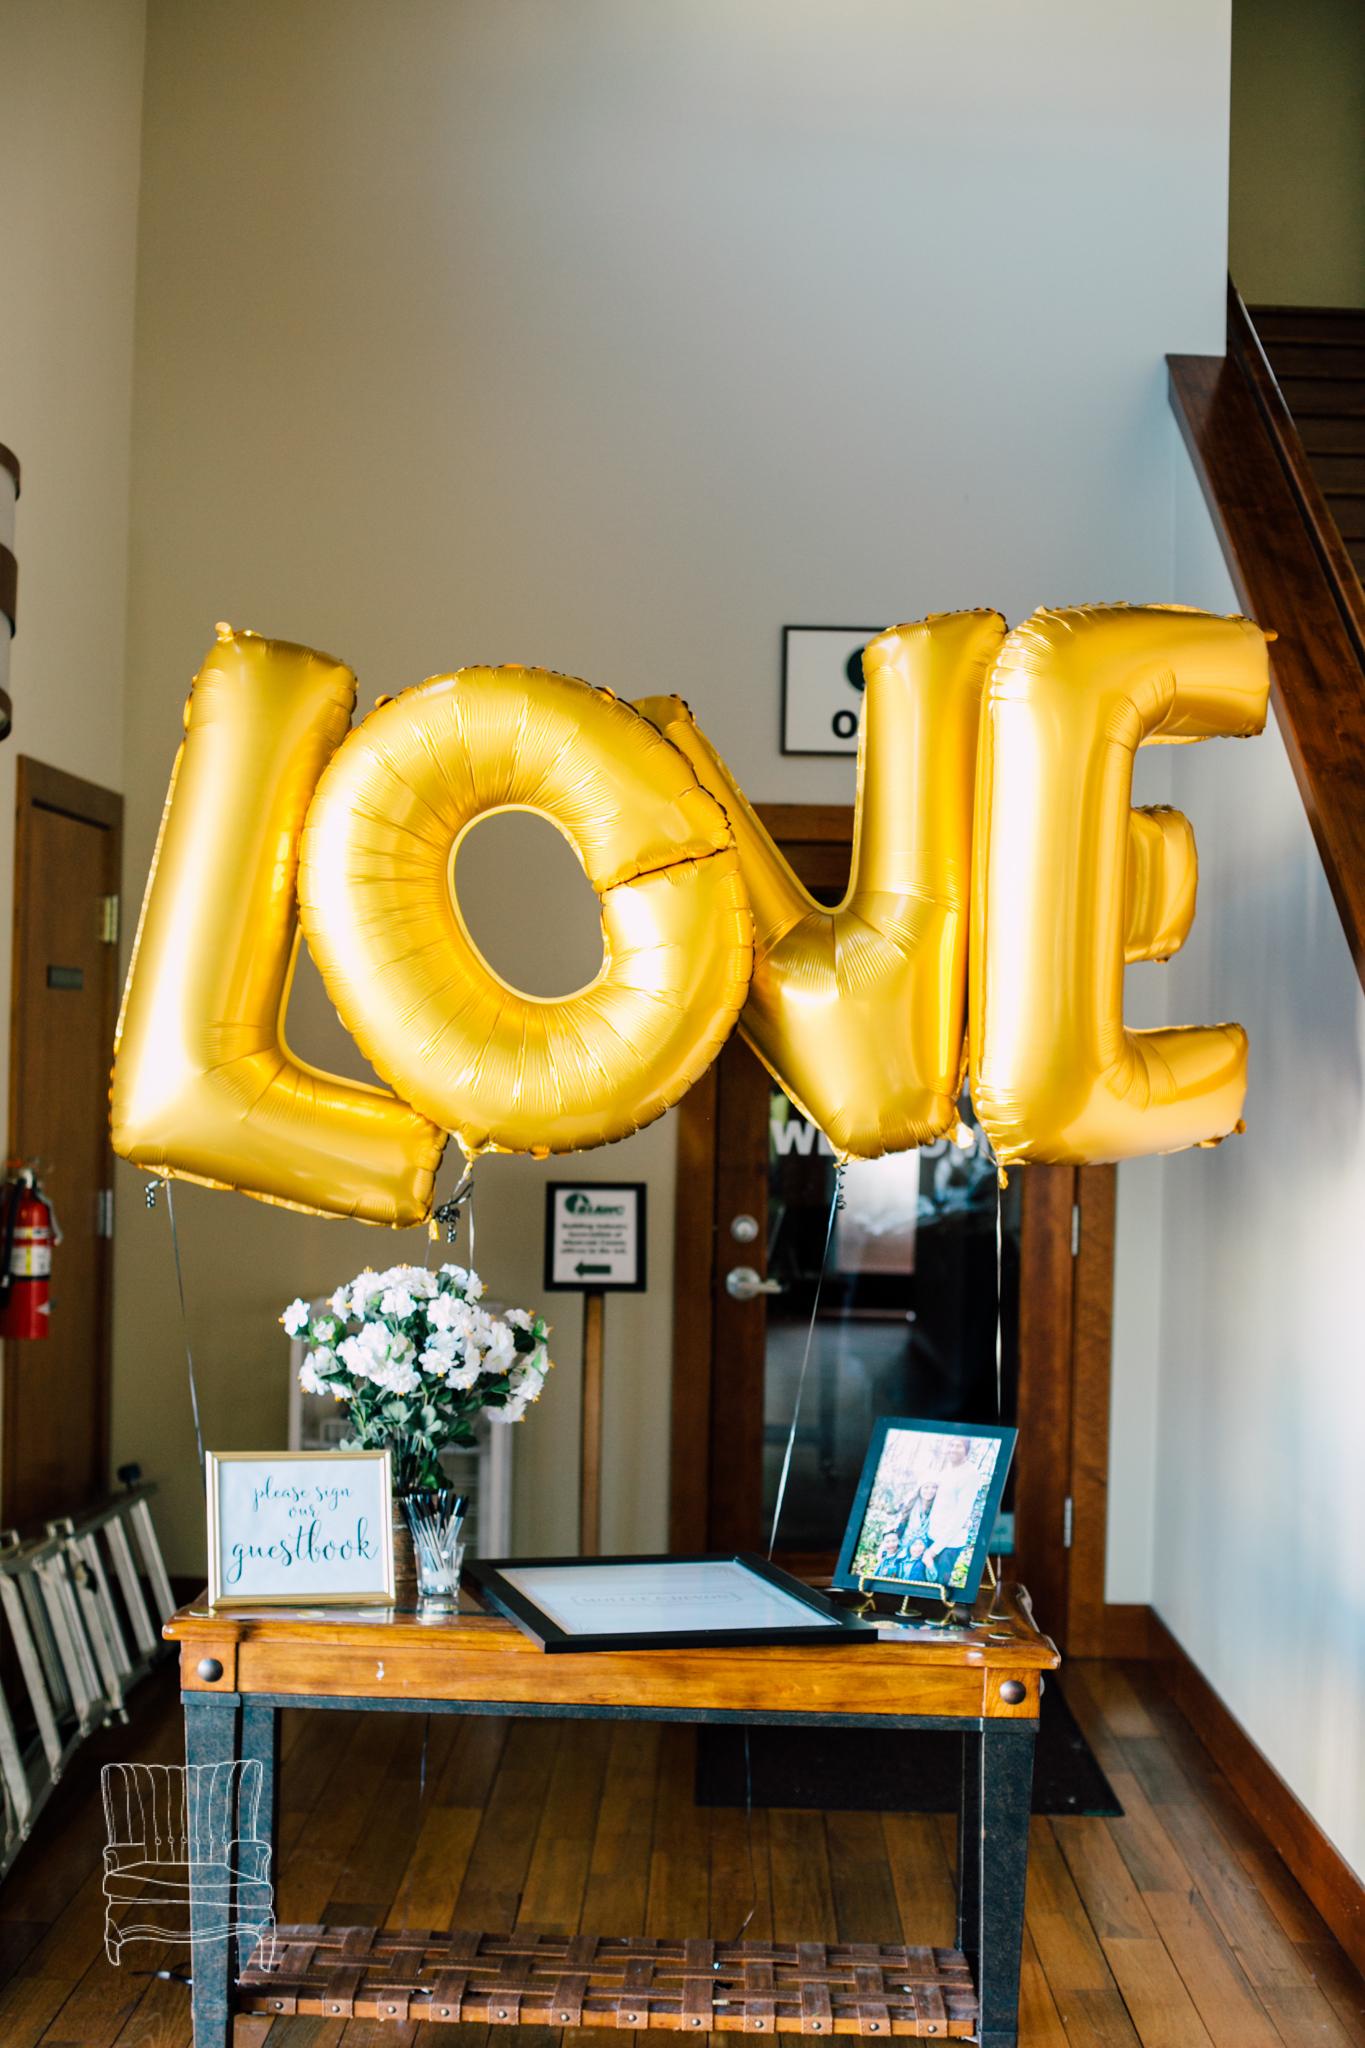 bellingham-washington-wedding-photographer-baker-creek-place-mollee-5.jpg